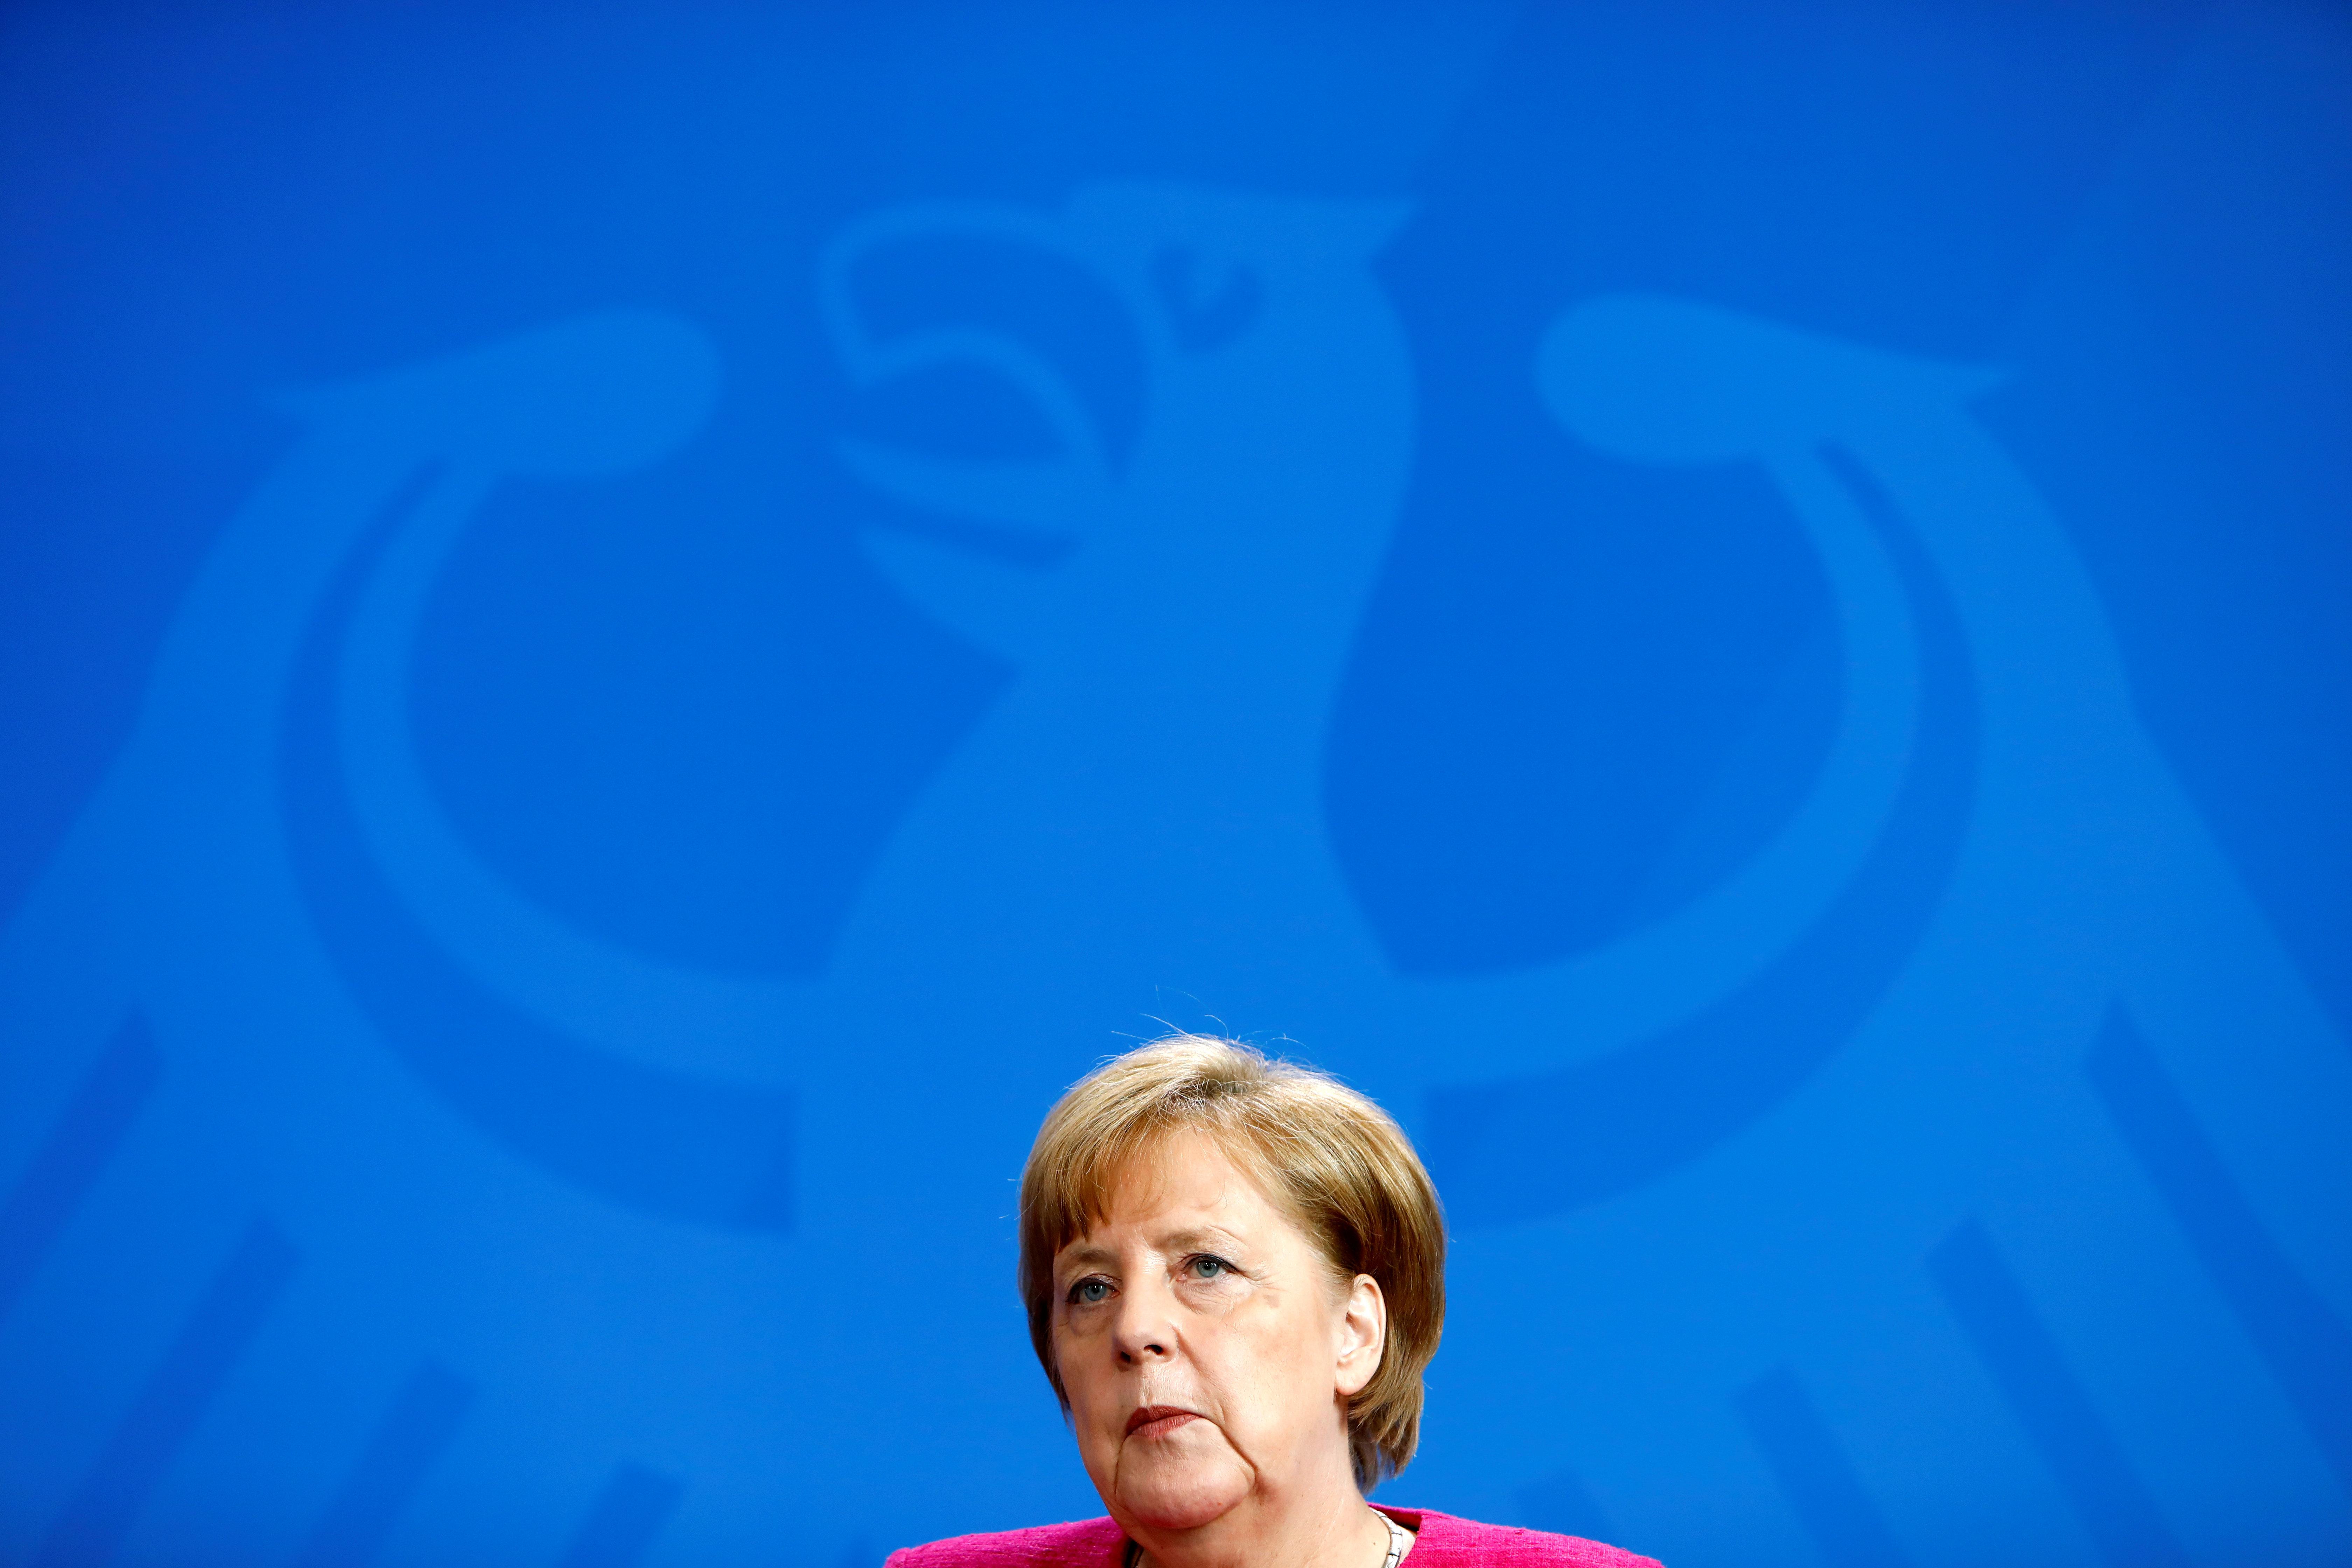 Europa-Initiative im Asylstreit: Merkel soll EU-Sondergipfel